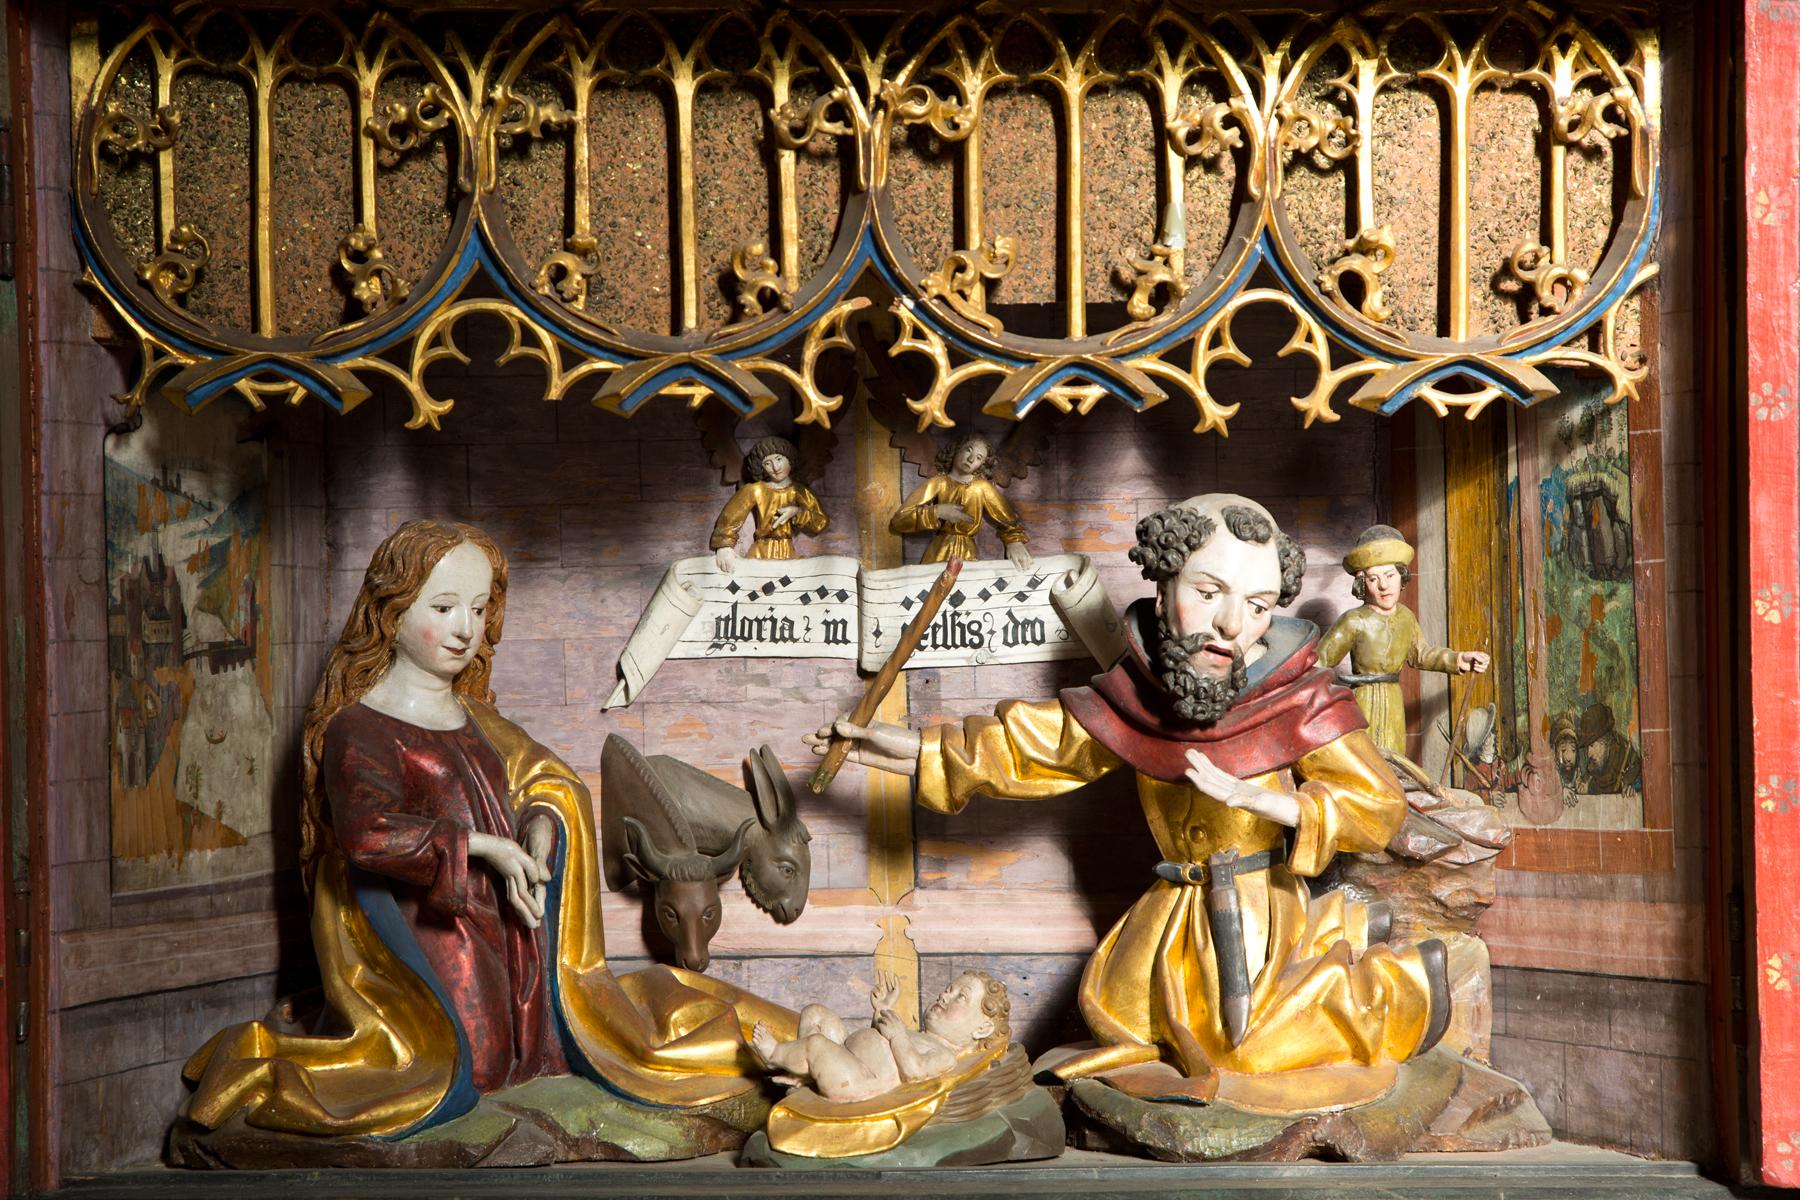 Jesu Geburt, Detail Flügelaltar Magdalenekapelle - Hall in Tirol